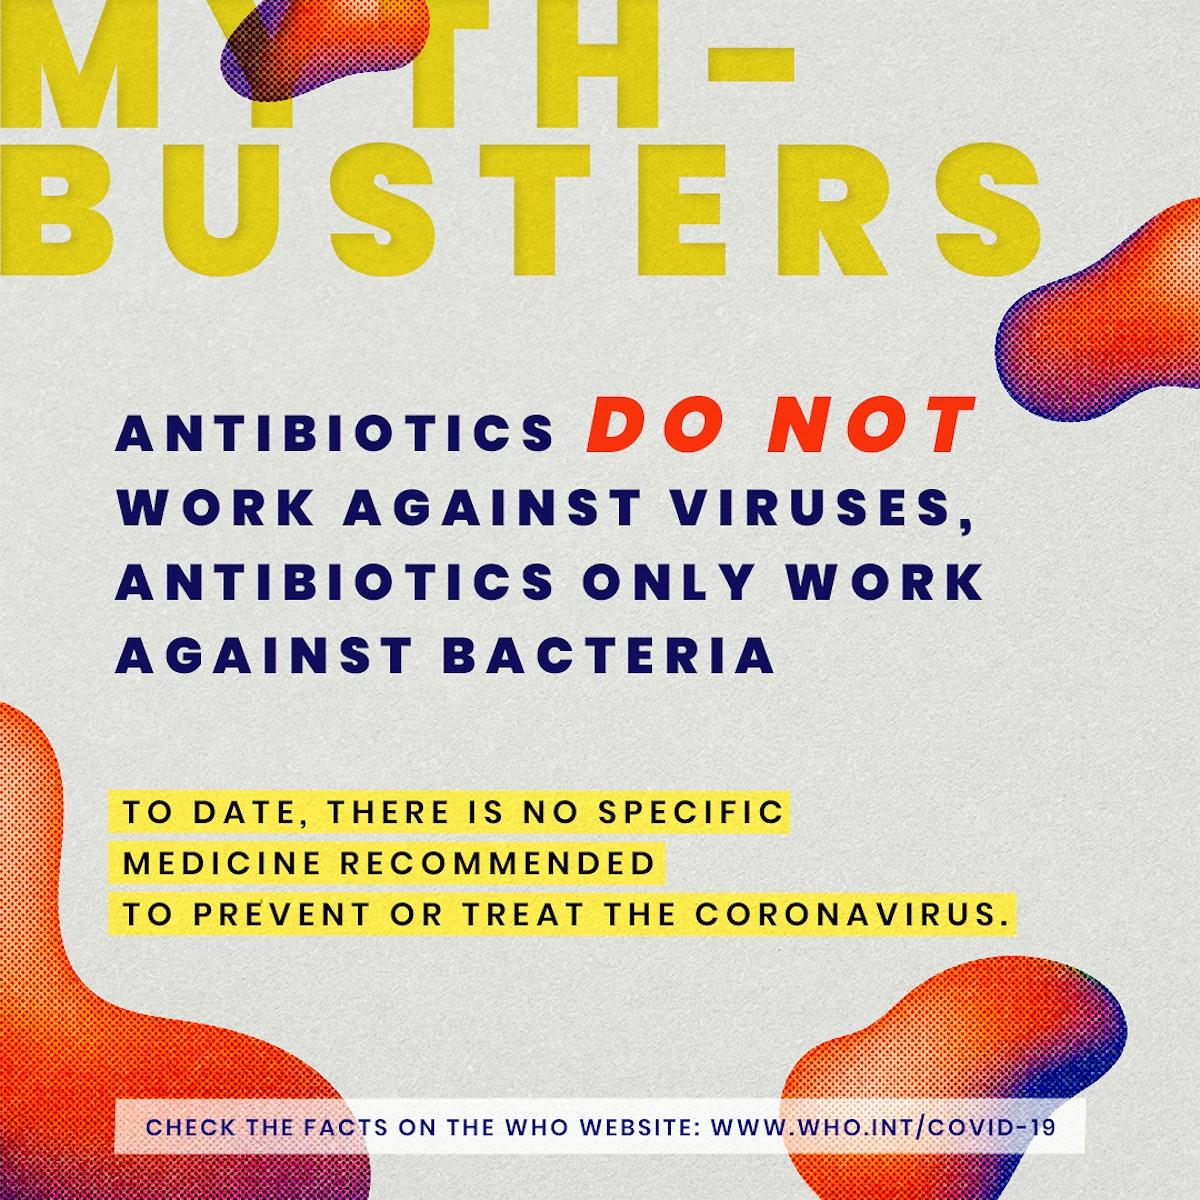 Antibiotics myth-busters during coronavirus pandemic social template source WHO mockup